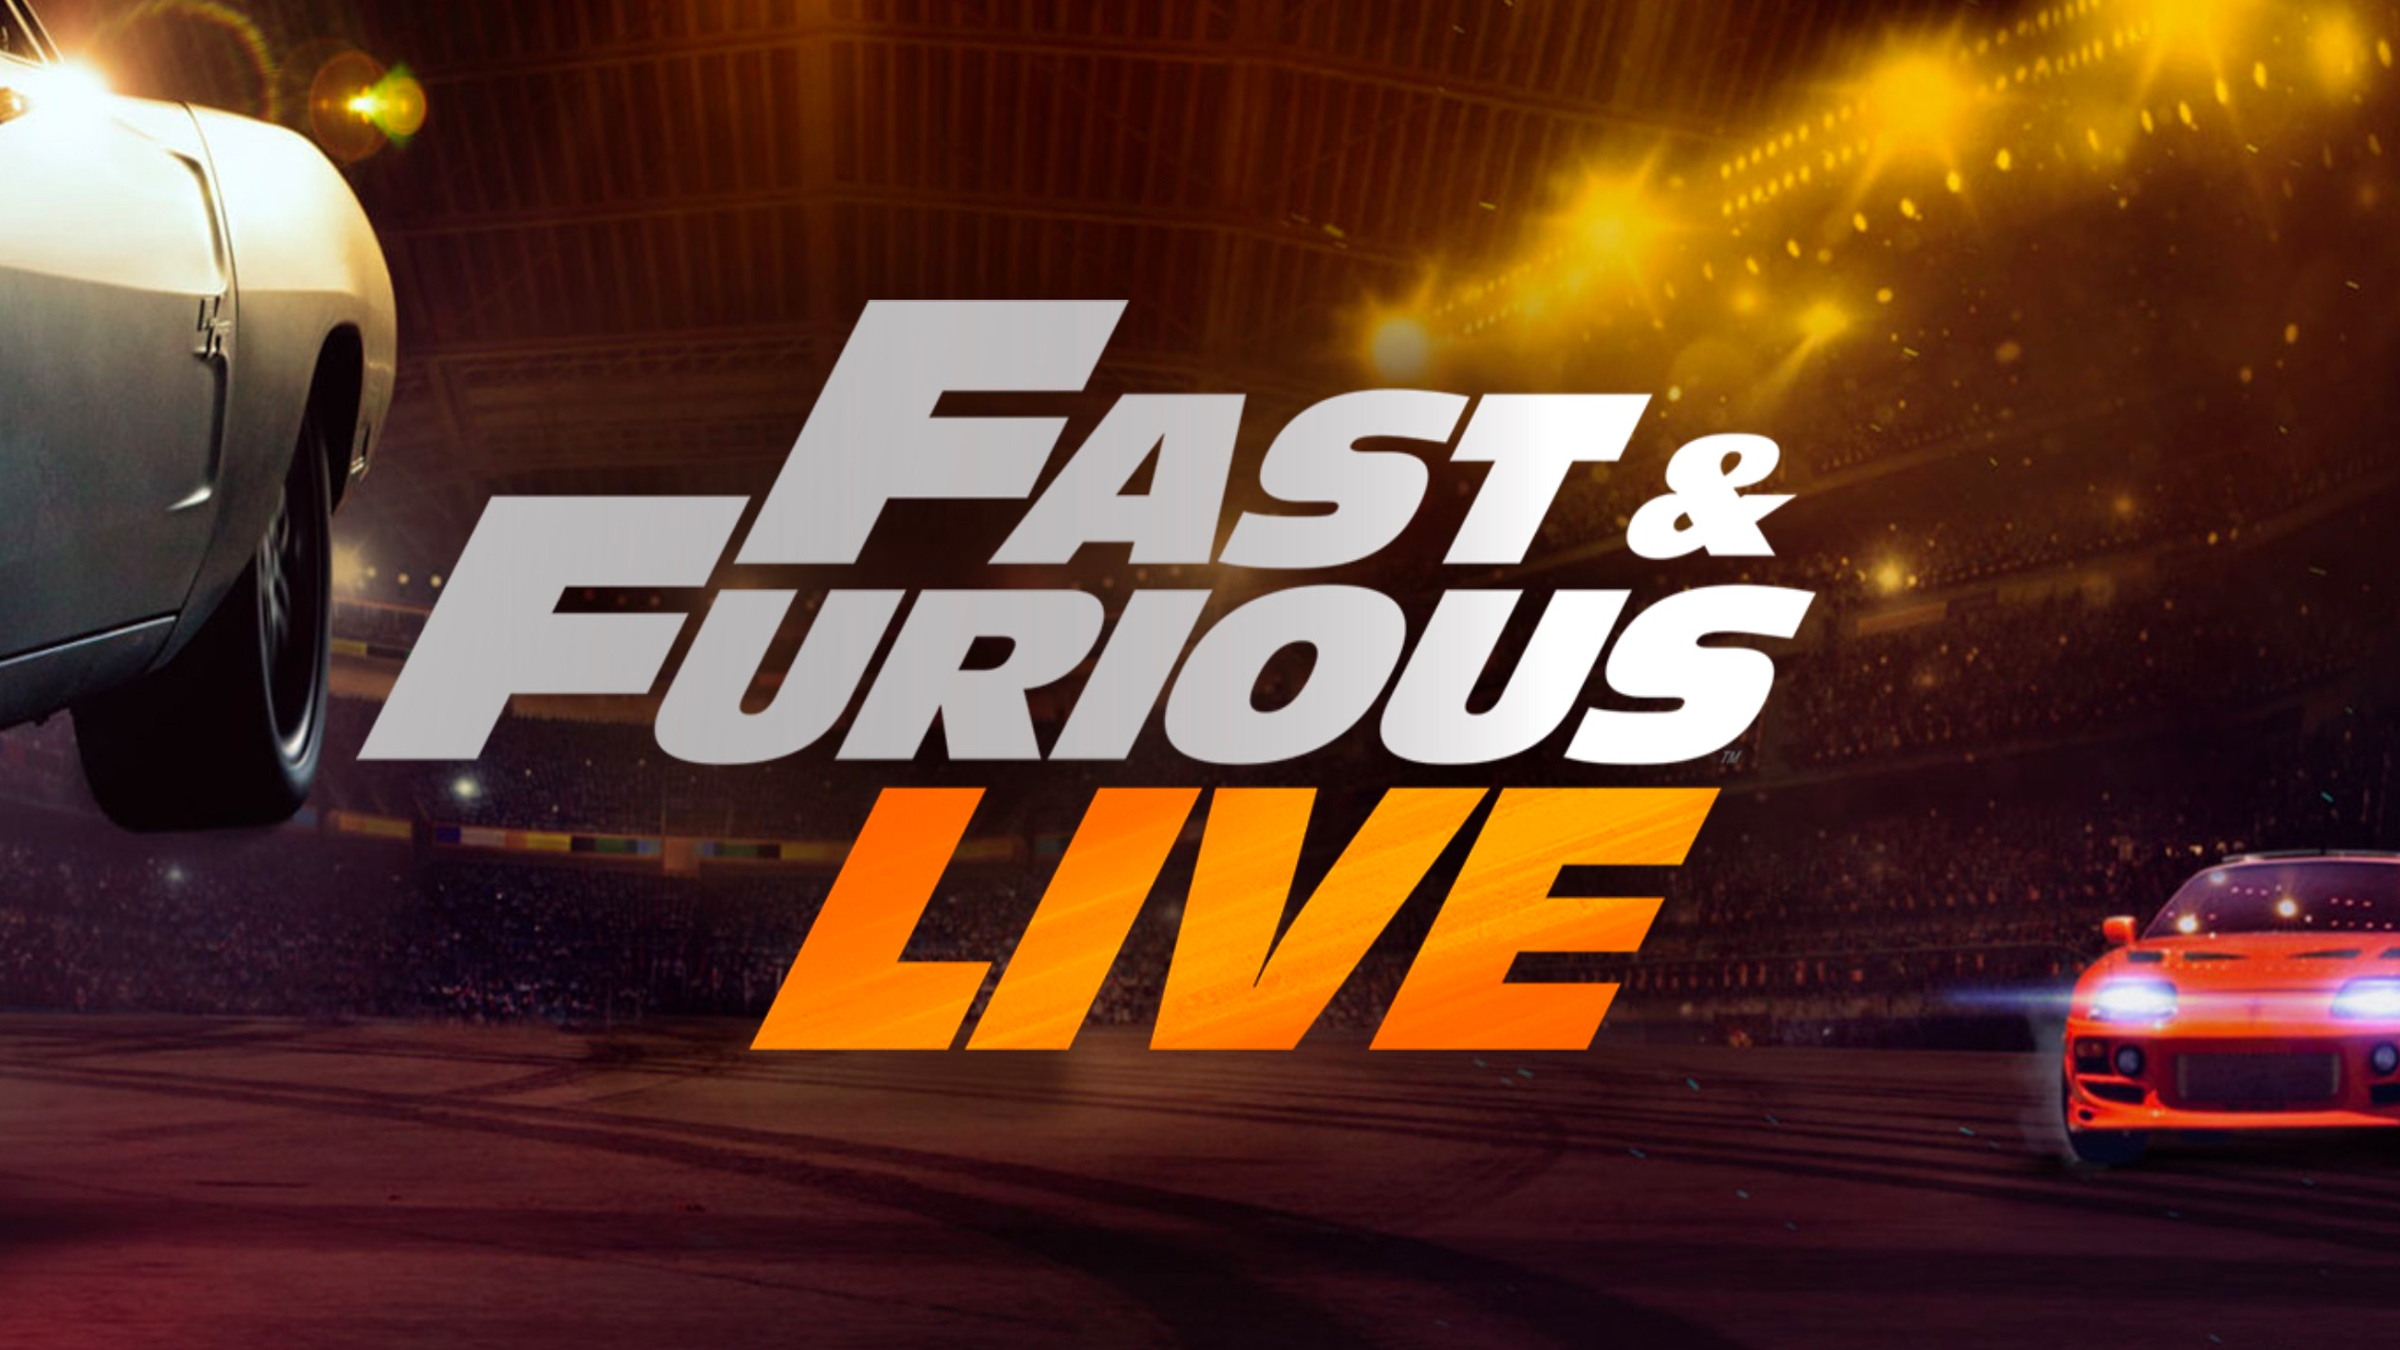 Fast   furious live